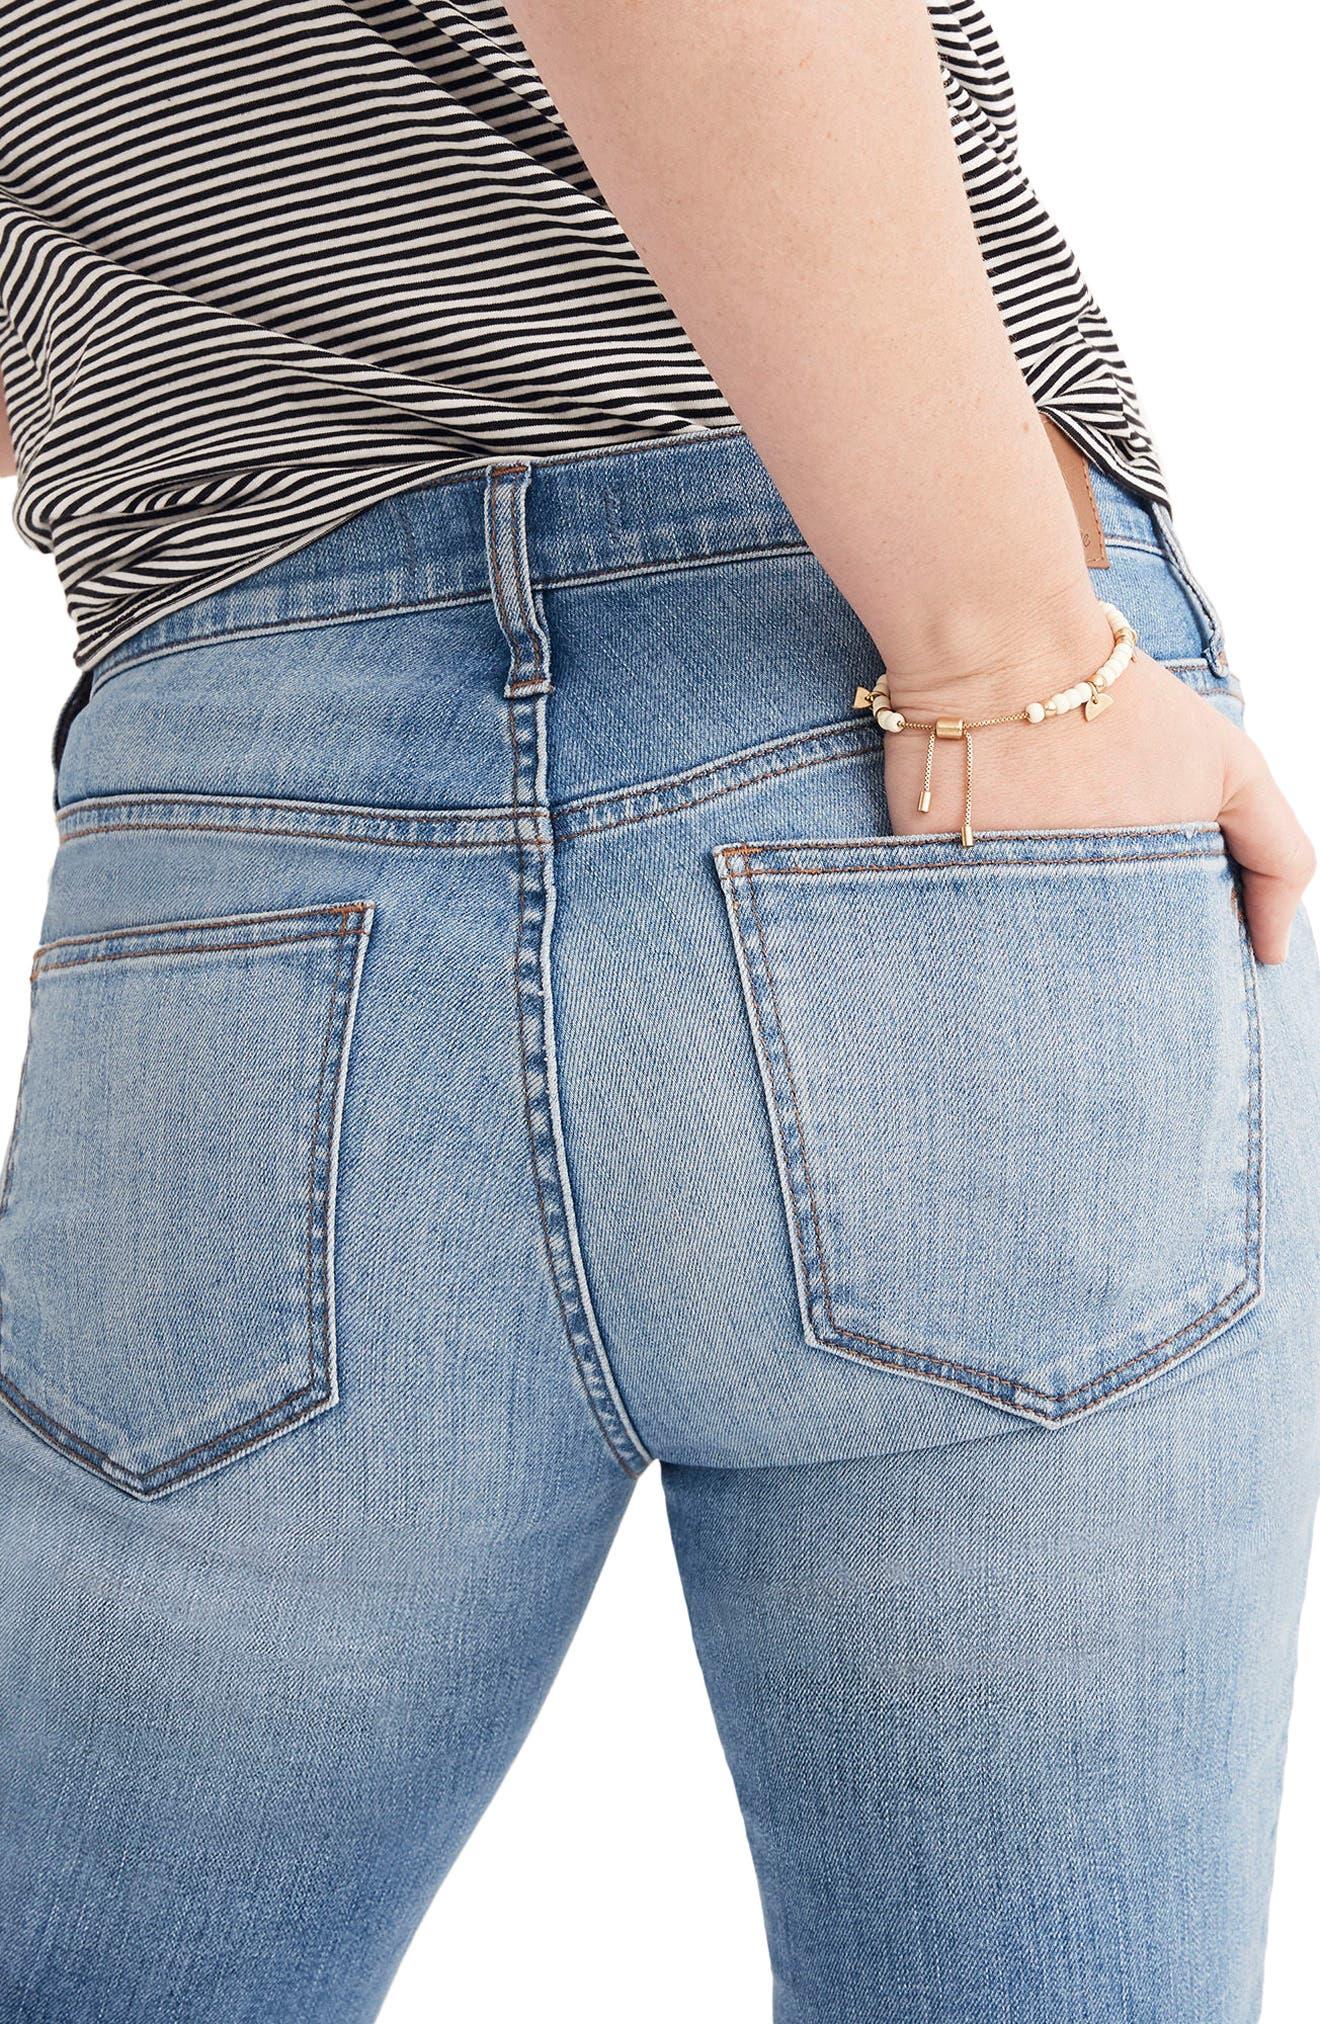 Alternate Image 2  - Madewell 9-Inch Seamed High Waist Step Hem Skinny Jeans (August)